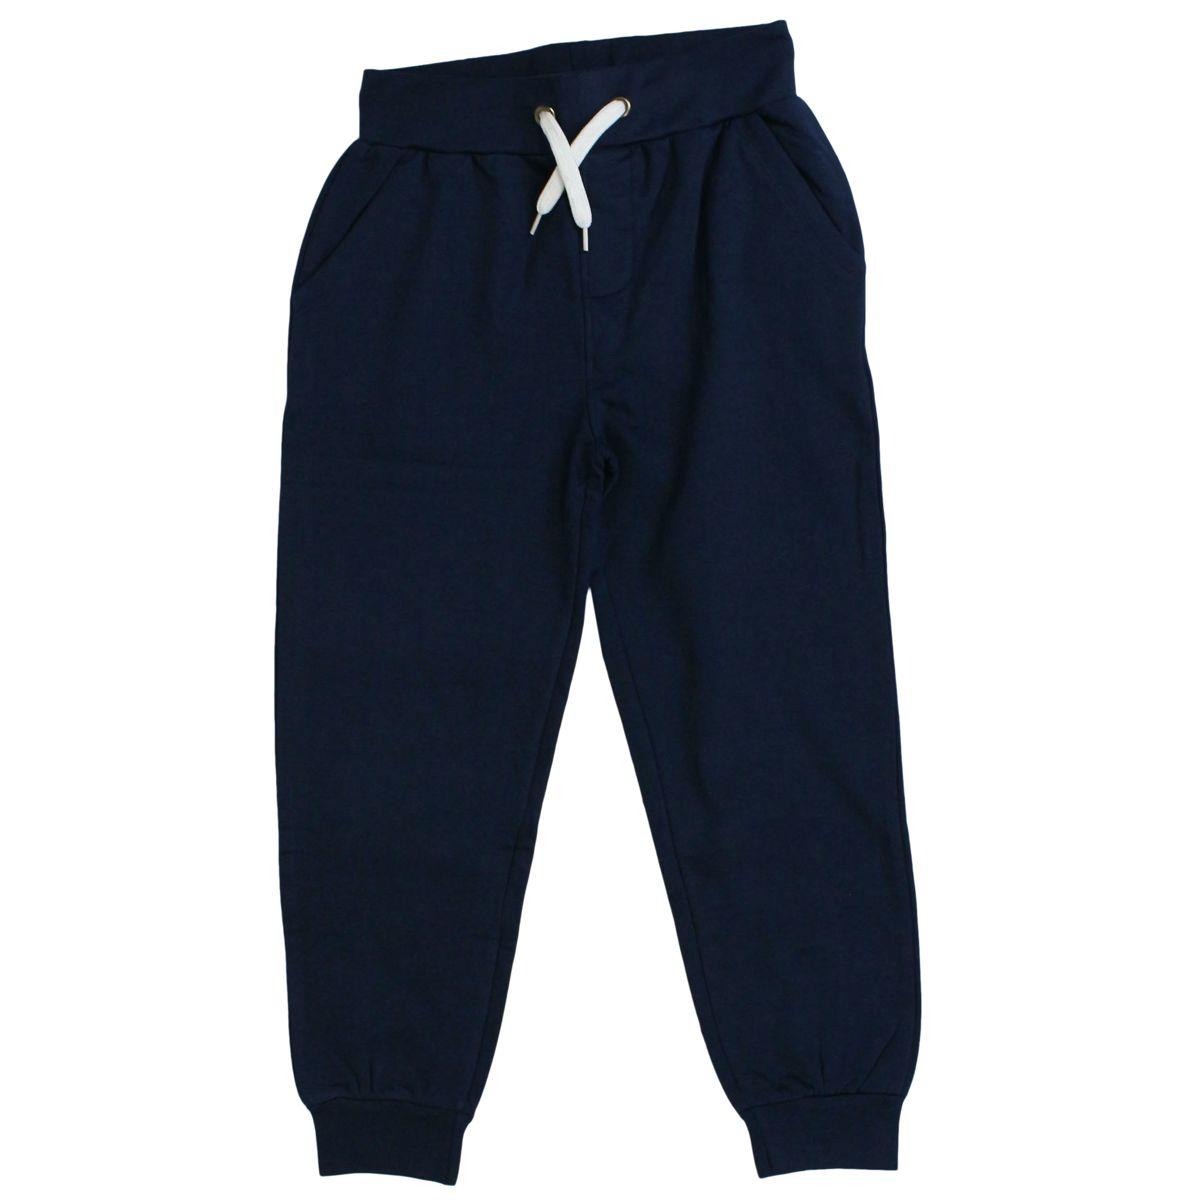 Cotton jojjing trousers with logo Blue Bikkembergs